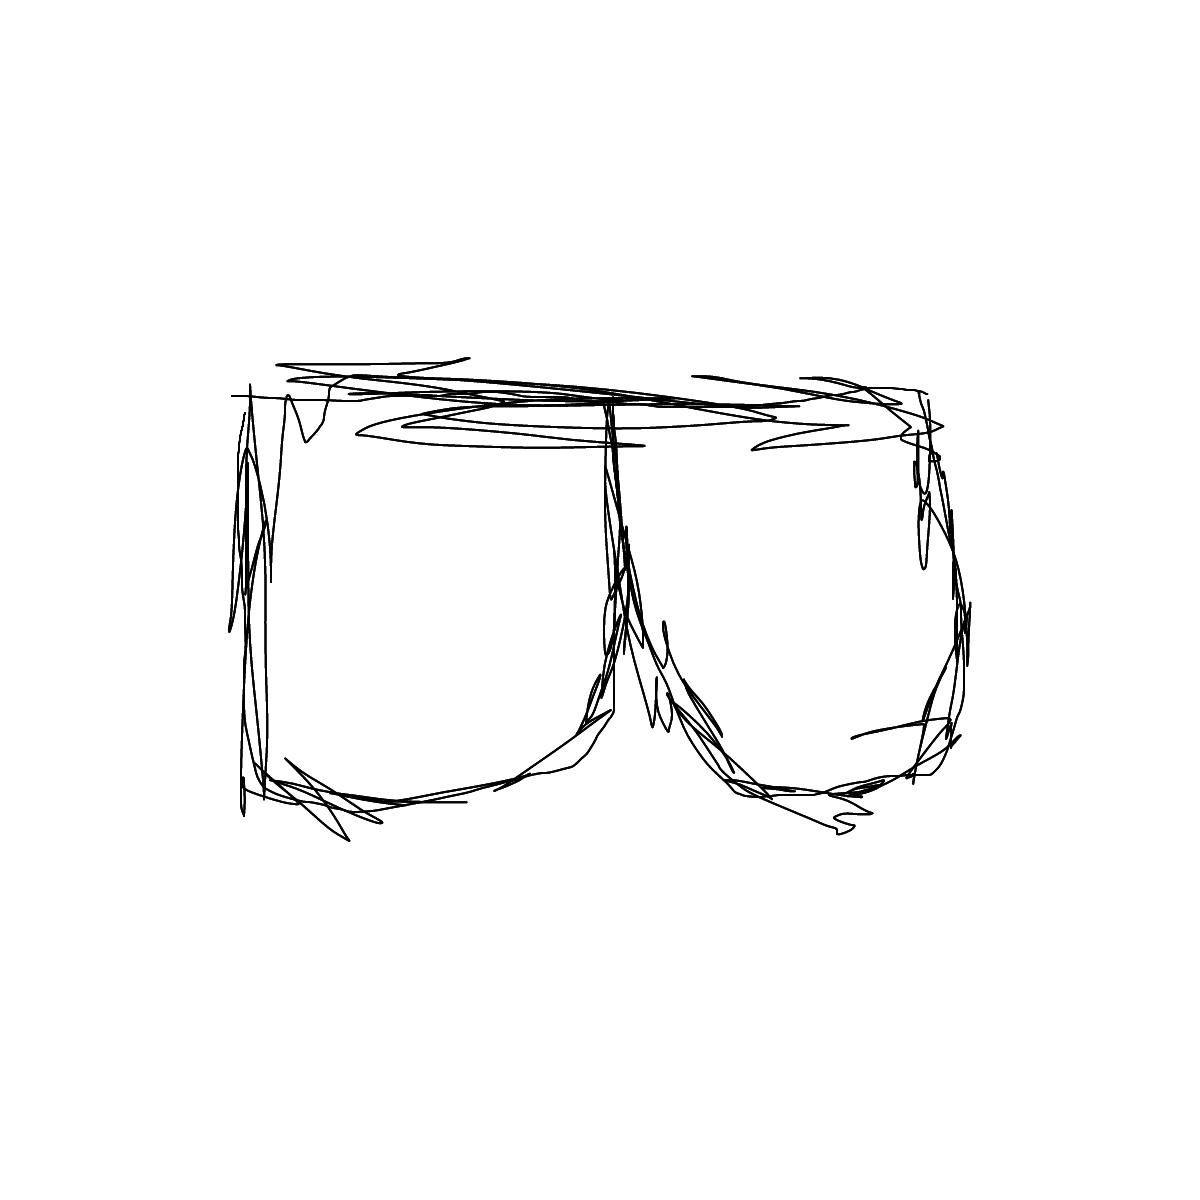 BAAAM drawing#14862 lat:44.5005149841308600lng: -80.3116149902343800